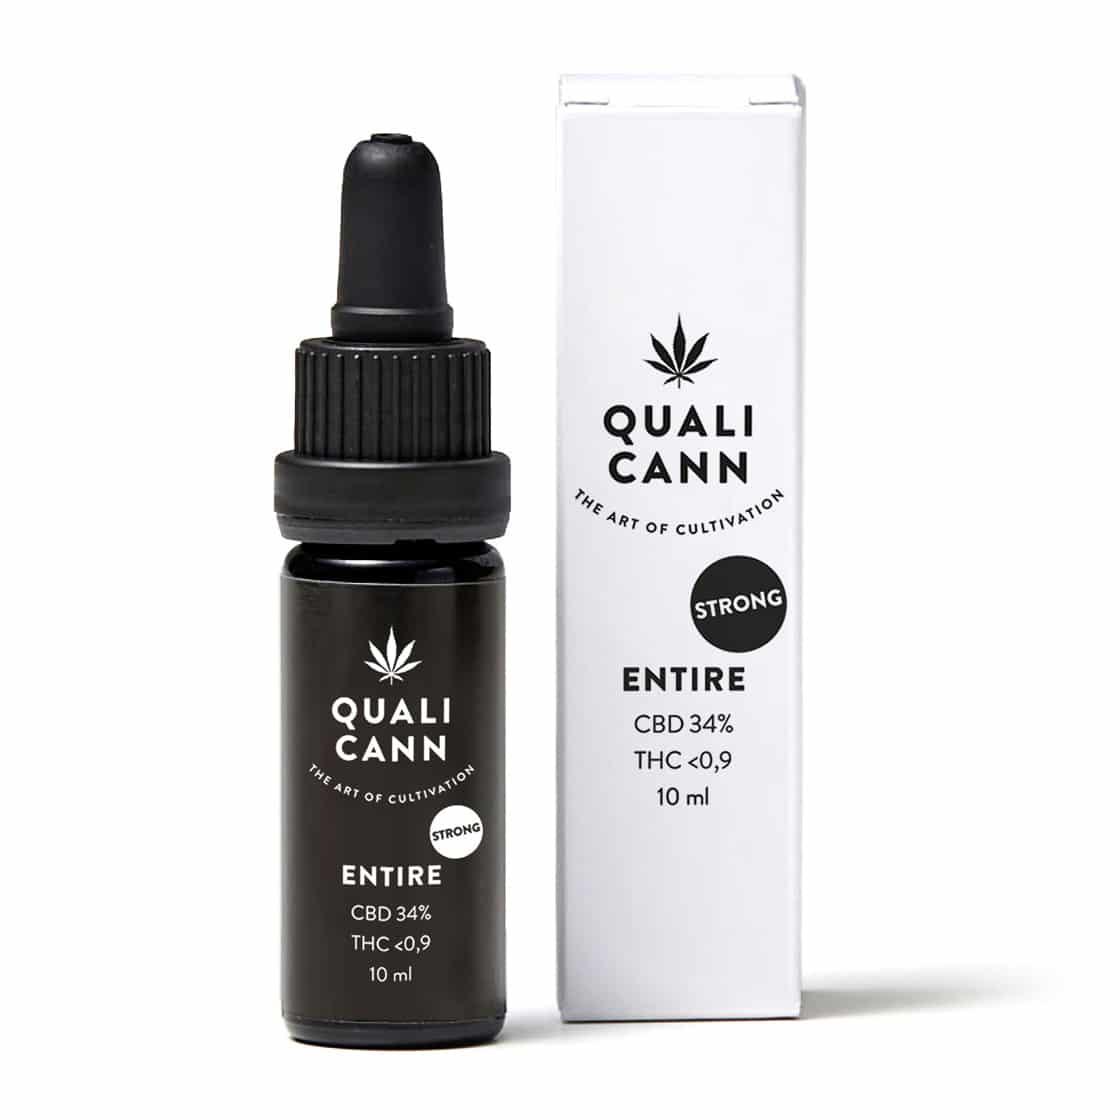 Quali_Cann_CBD_Oil